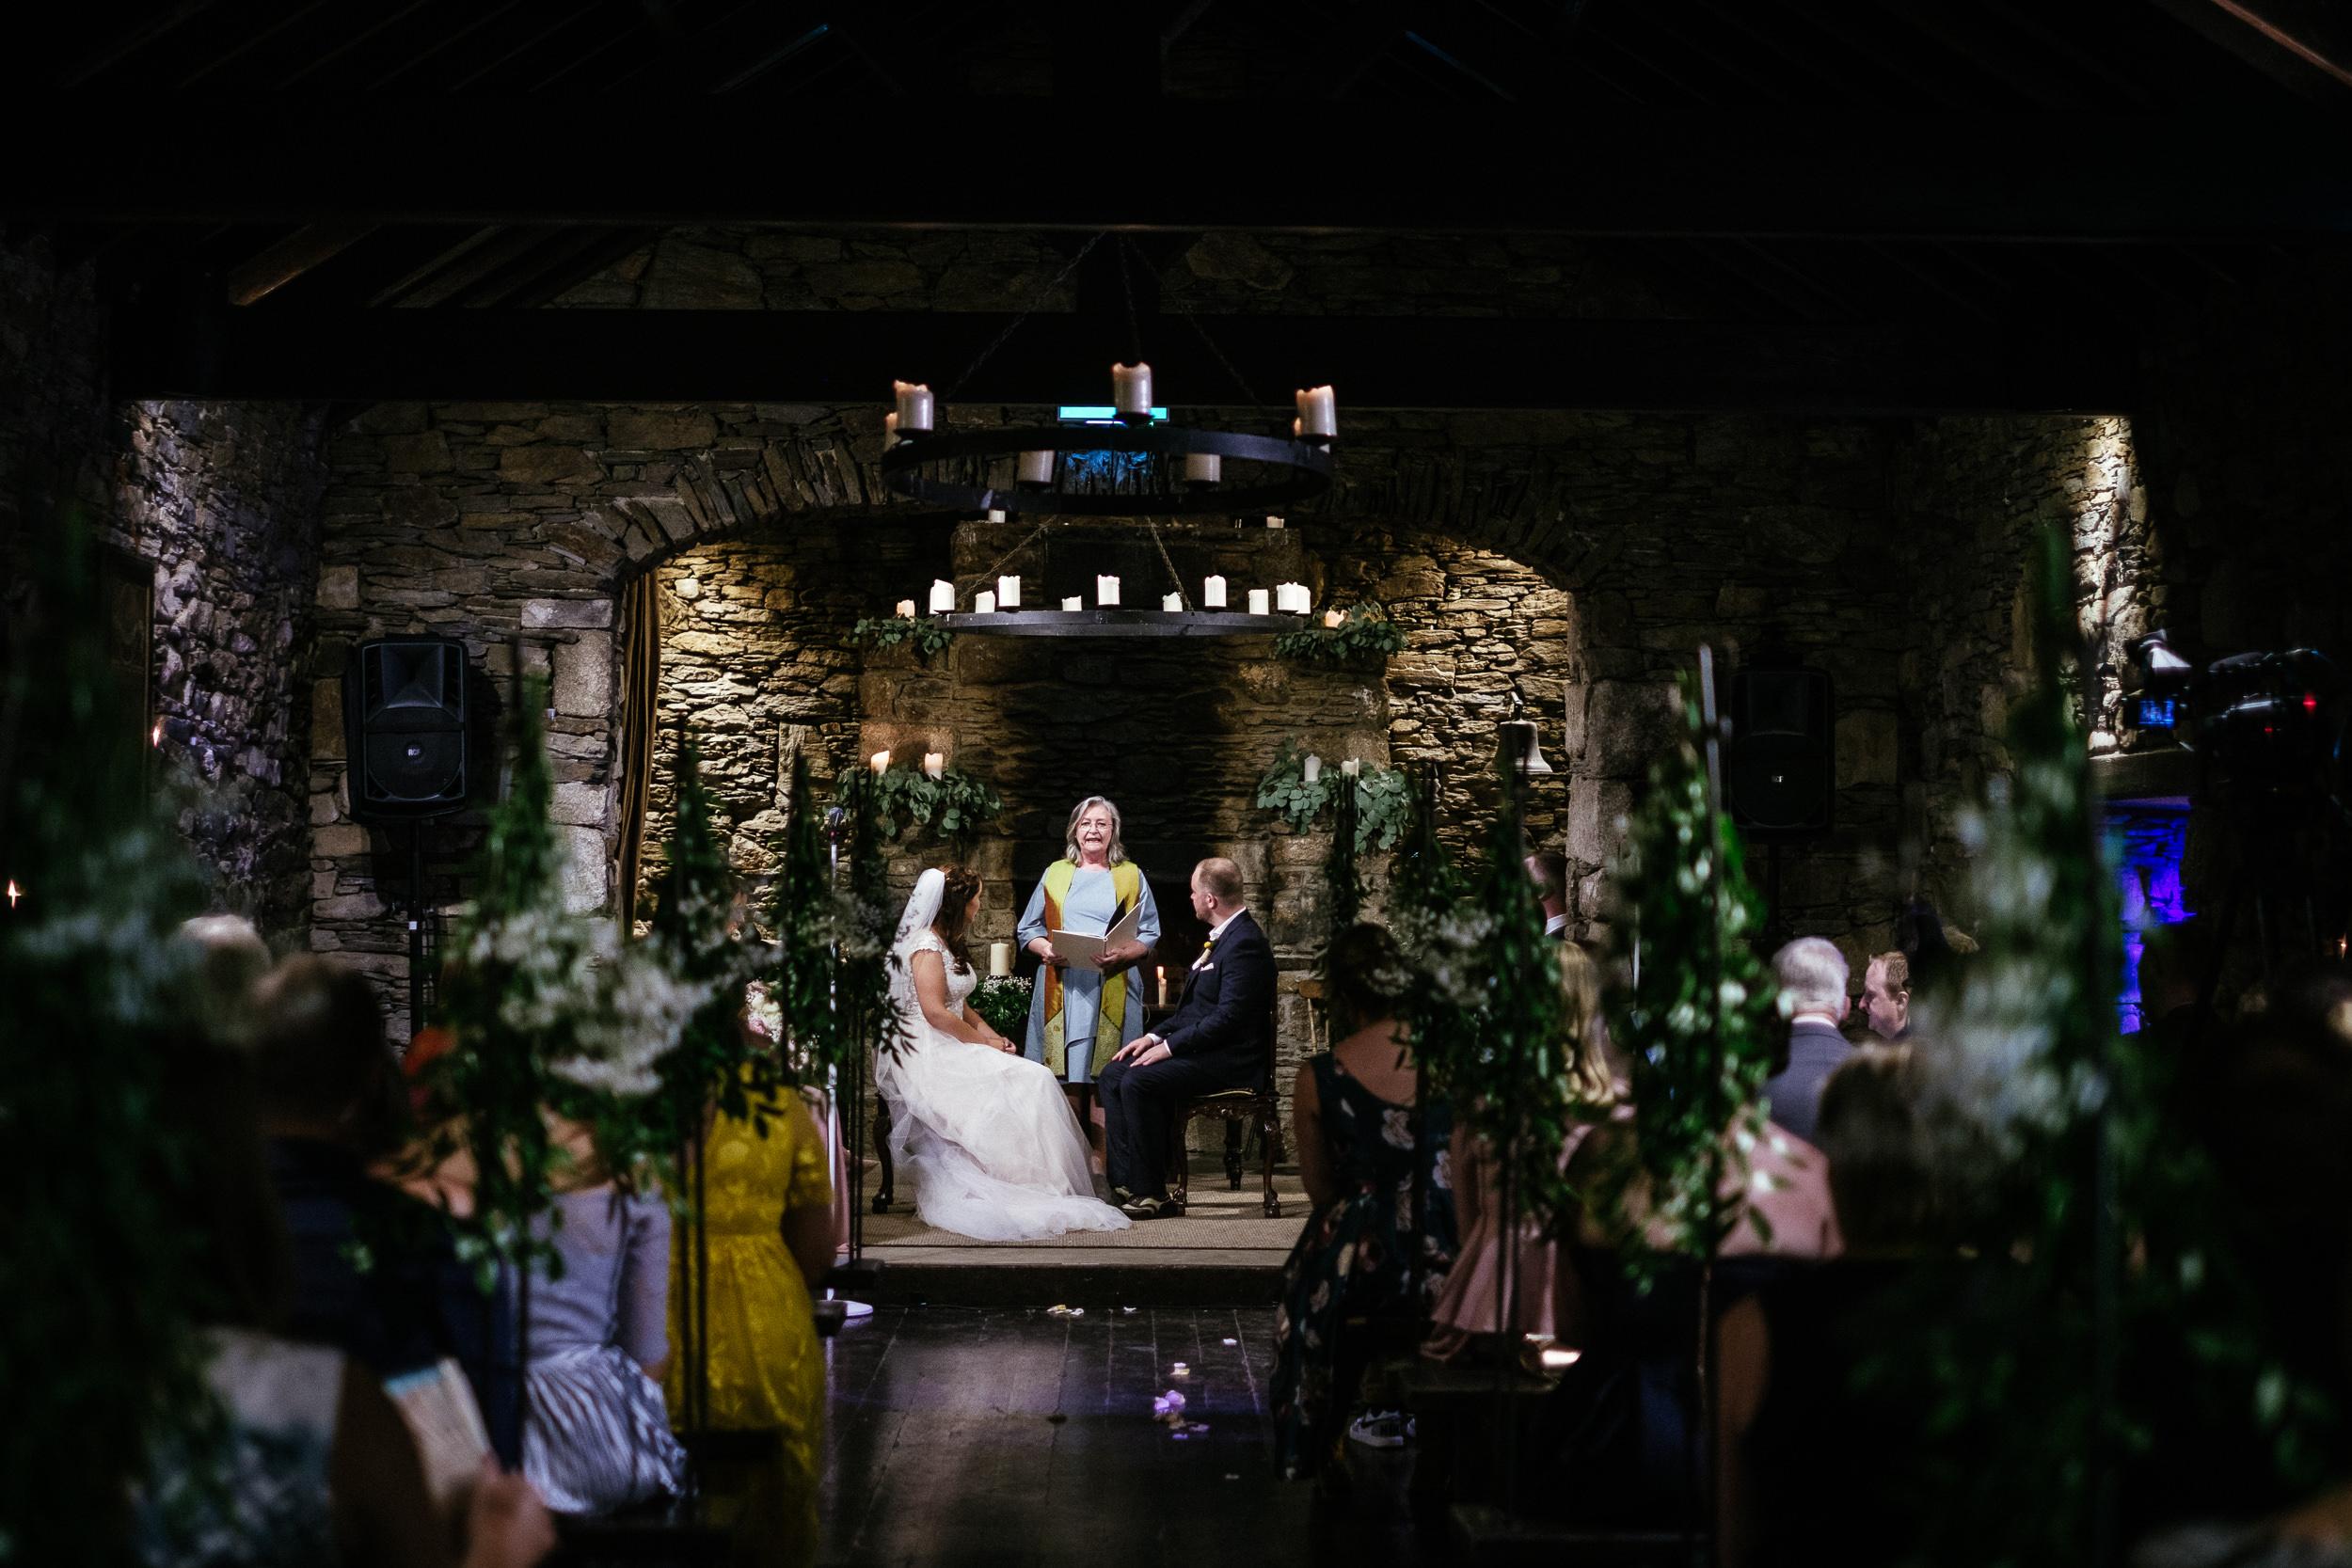 wedding ceremony in the barn at ballybeg house